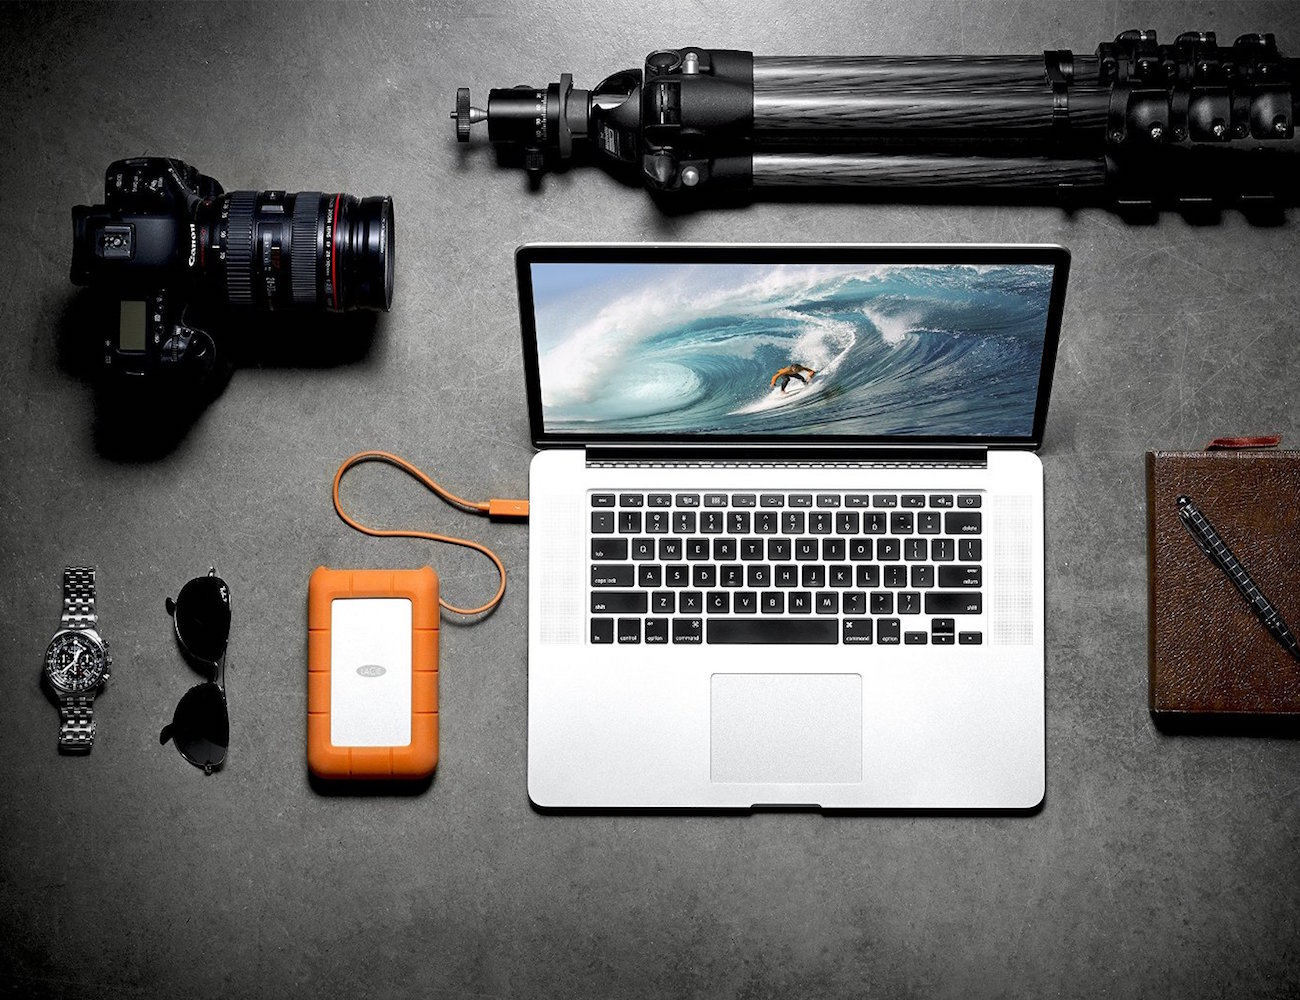 RAID Thunderbolt and USB Hard Drive by LaCie